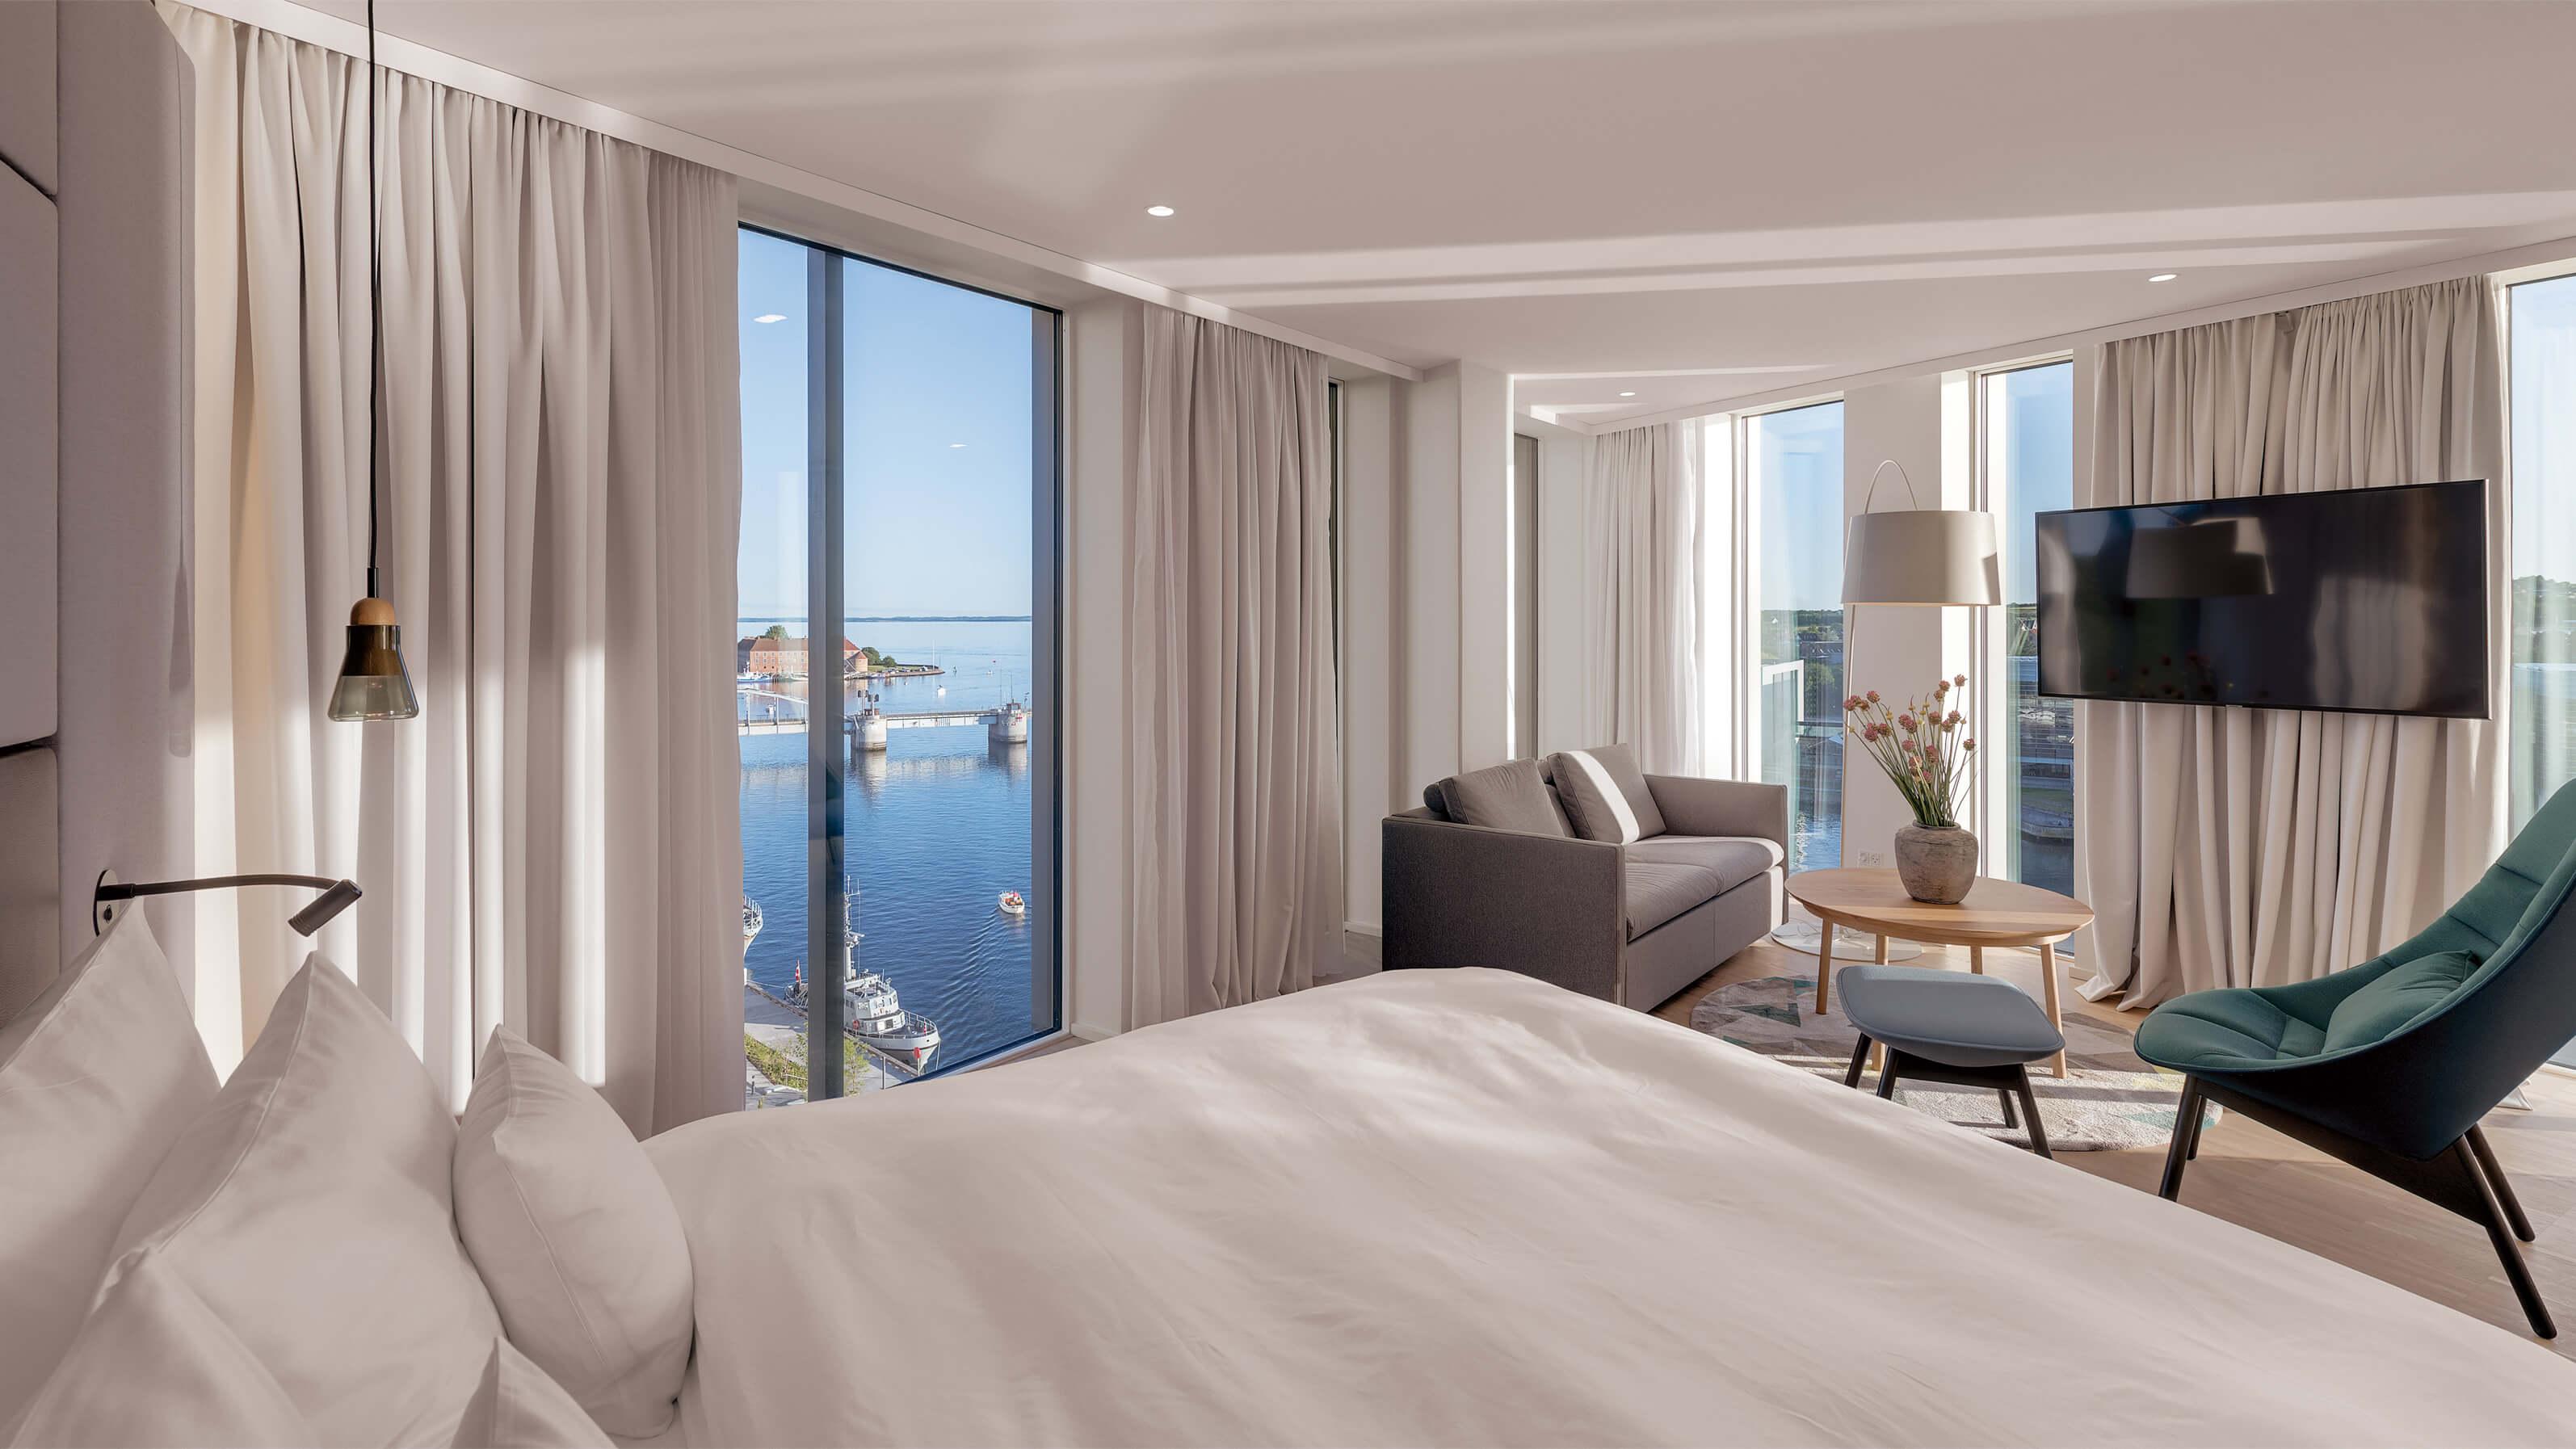 hotelausstattung-hoteleinrichtungen-bachhuber-Alsik-Sonderborg5